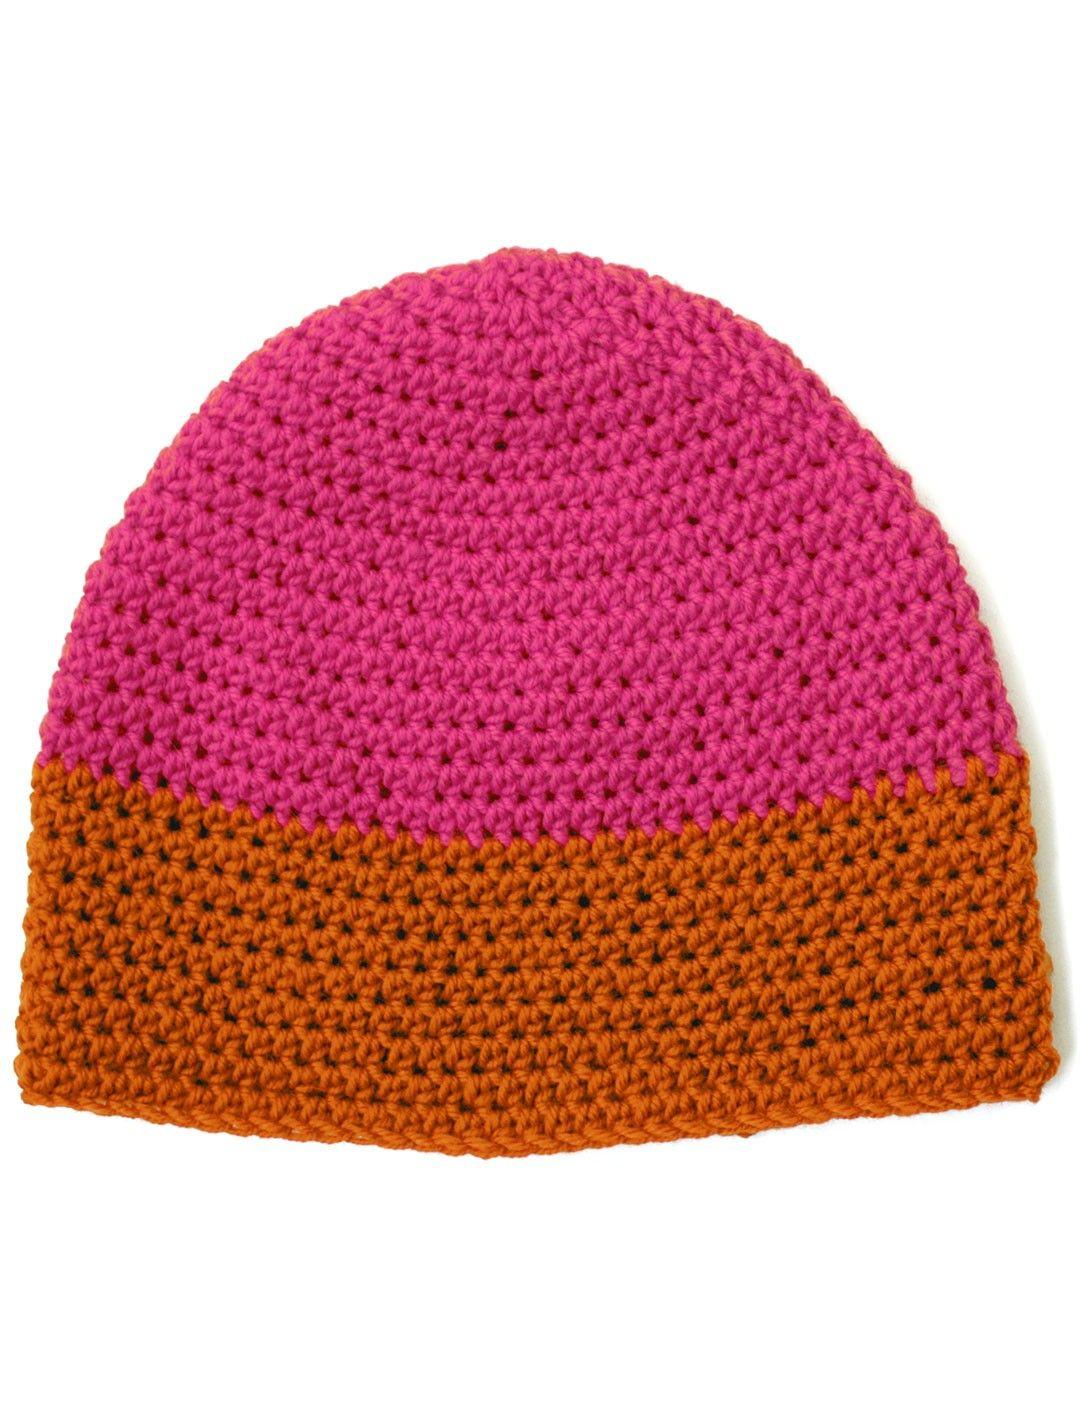 Yarnspirations.com - Patons Dipped Striped Crochet Hat - Free ...